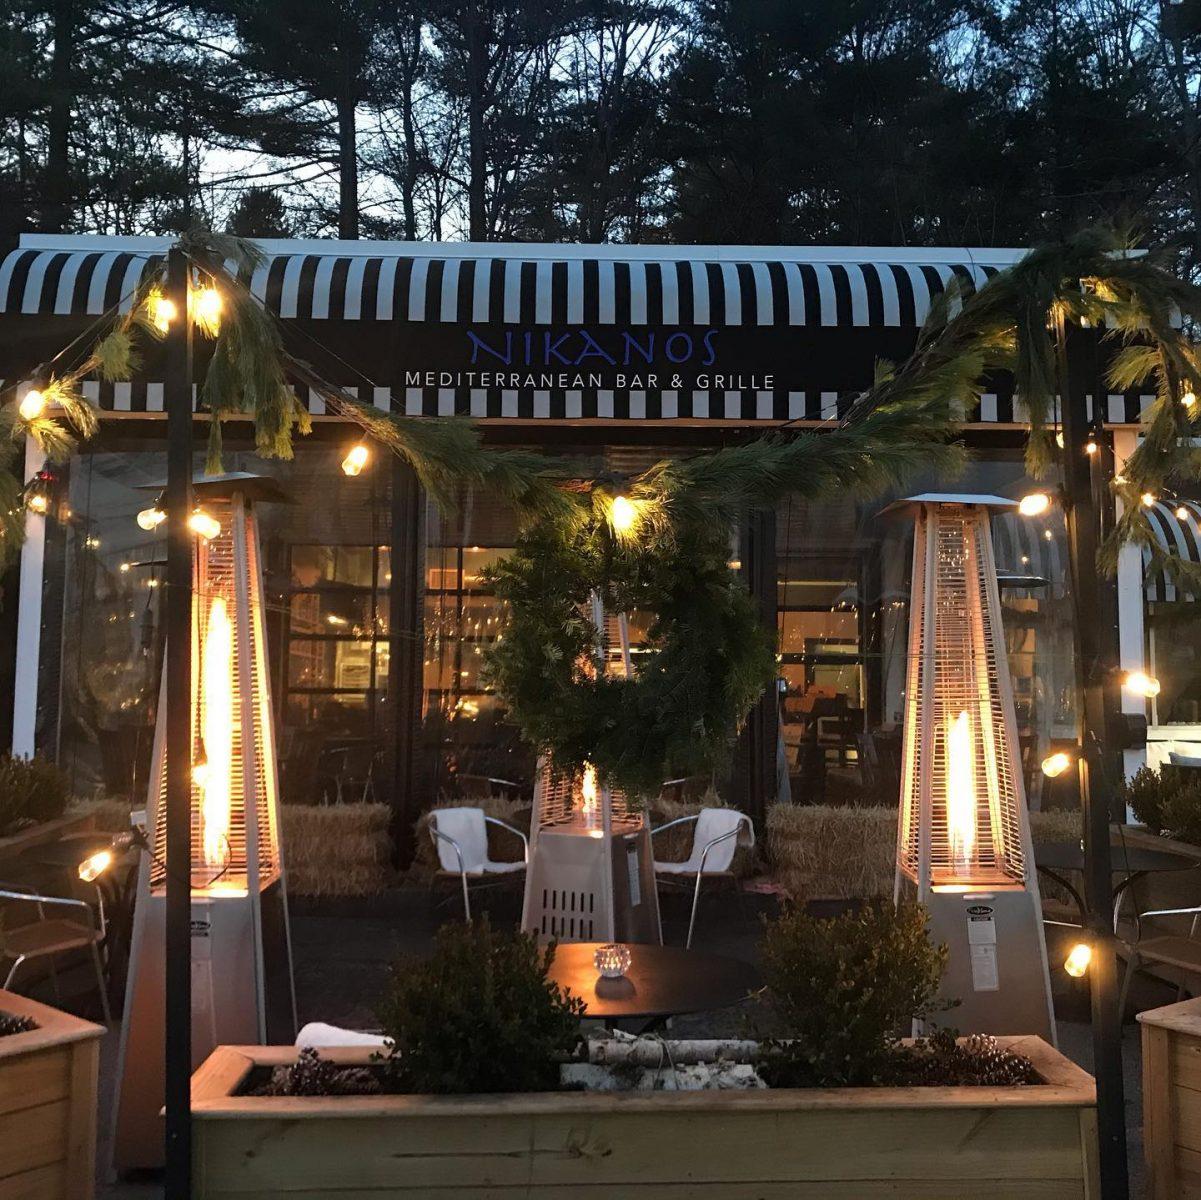 Nikanos Mediterranean Bar & Grille, Ogunquit, Maine outdoor dining greek food fireplace